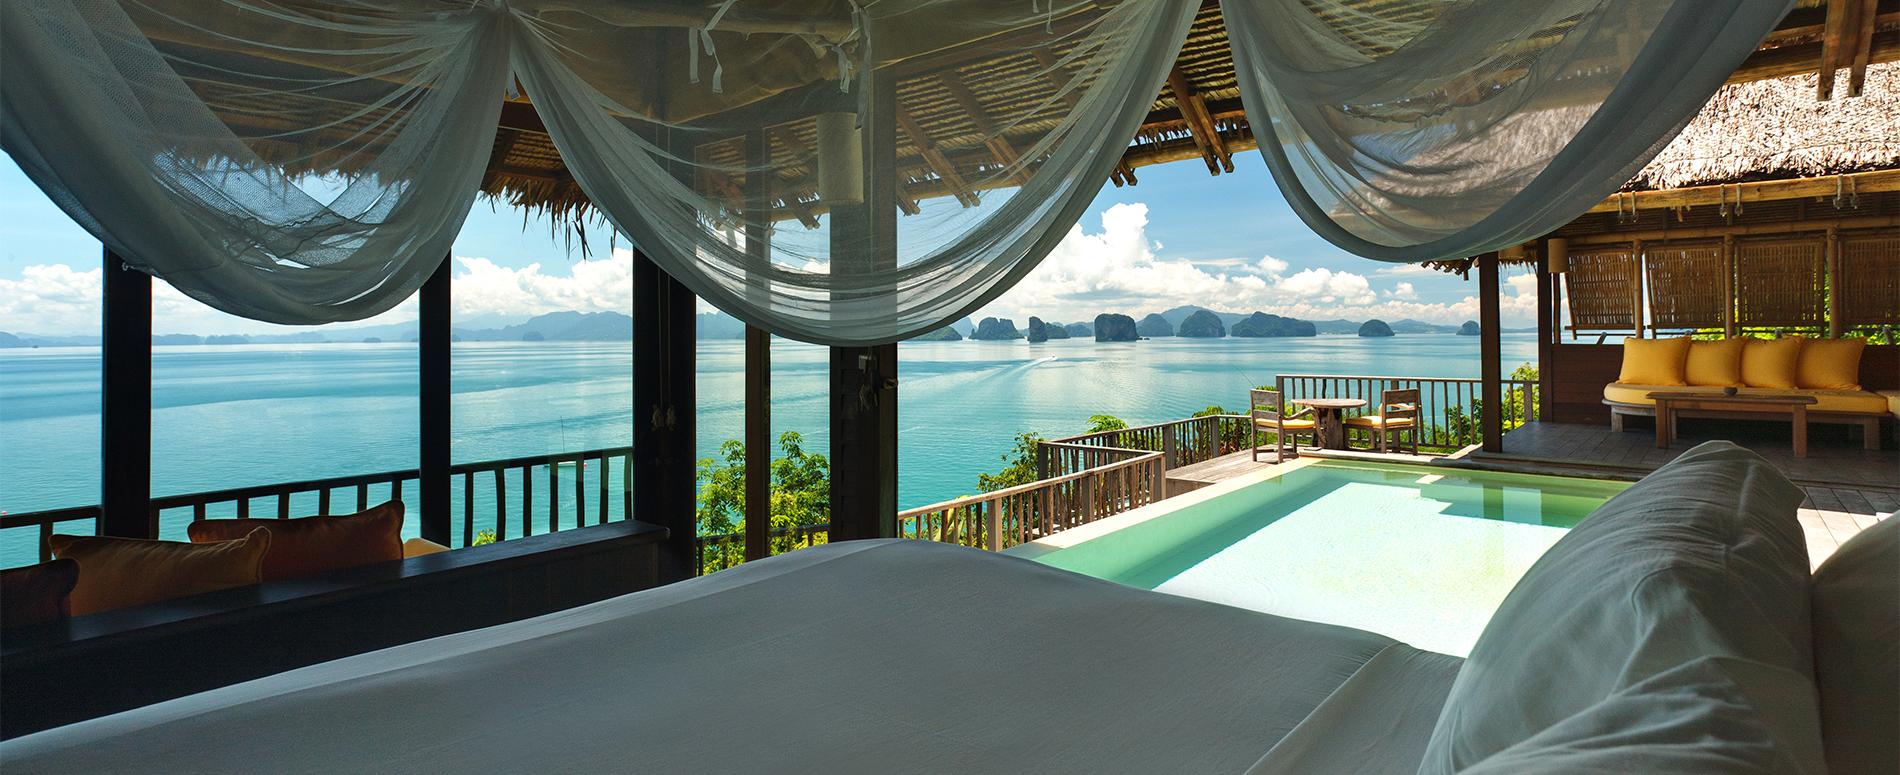 Hotels in Nha Trang